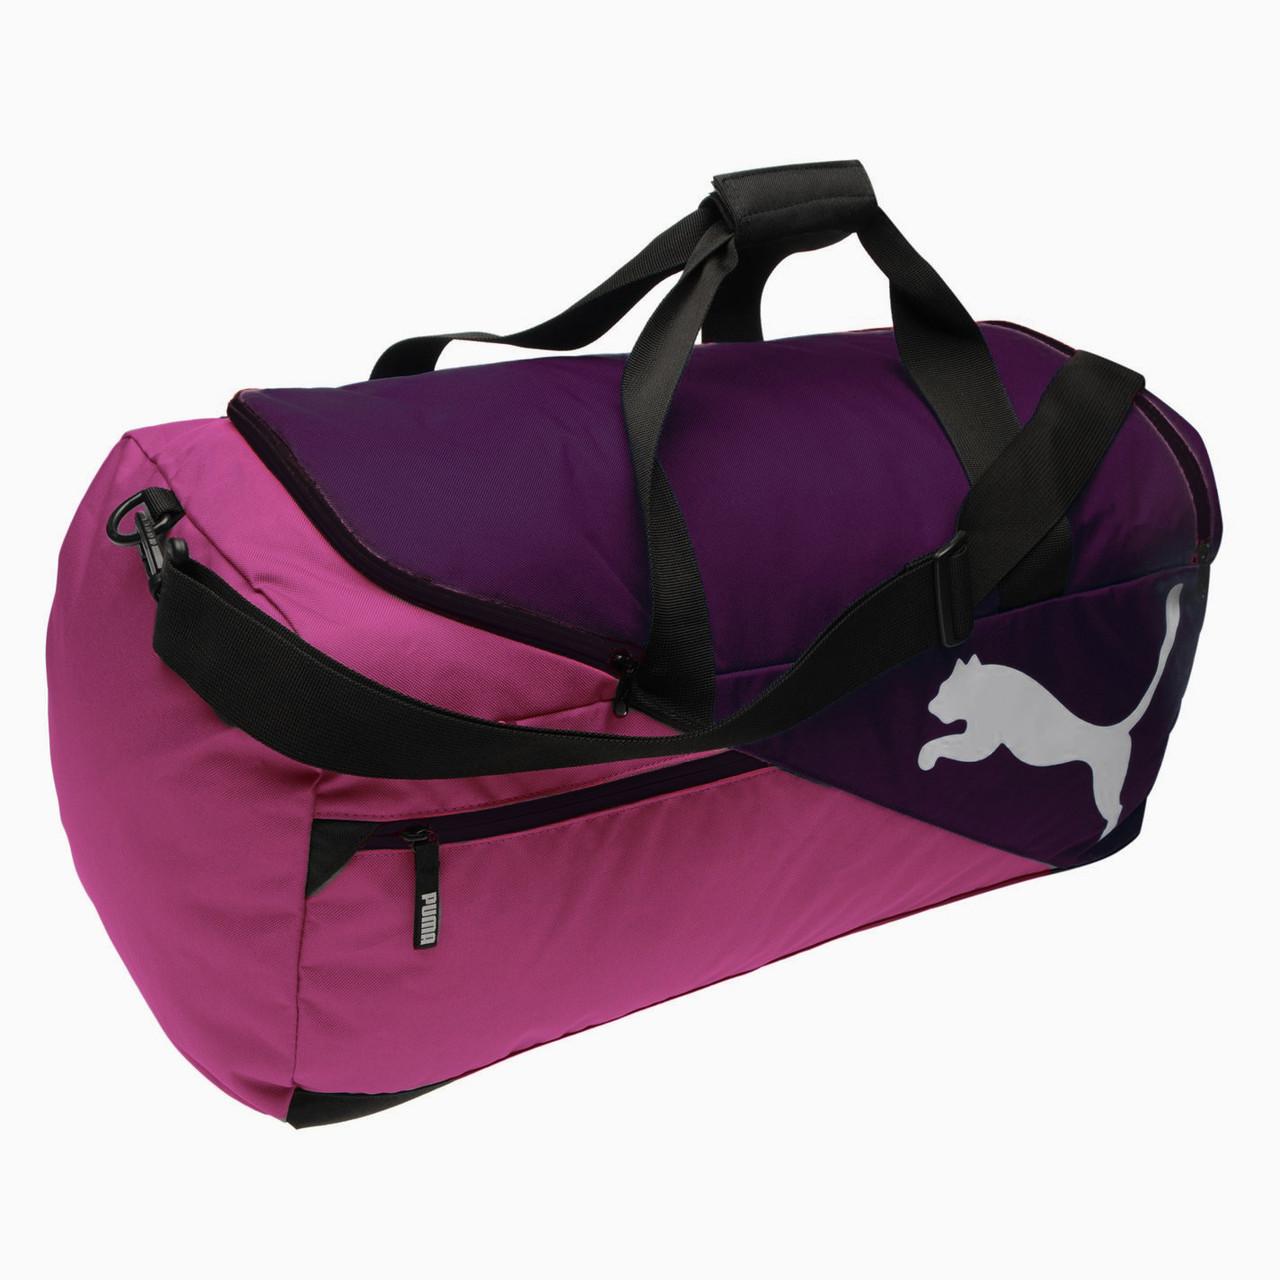 627e2a2c45ab Спортивная сумка Puma Fundamentals Medium Bag Magenta Purple 60L Оригинал